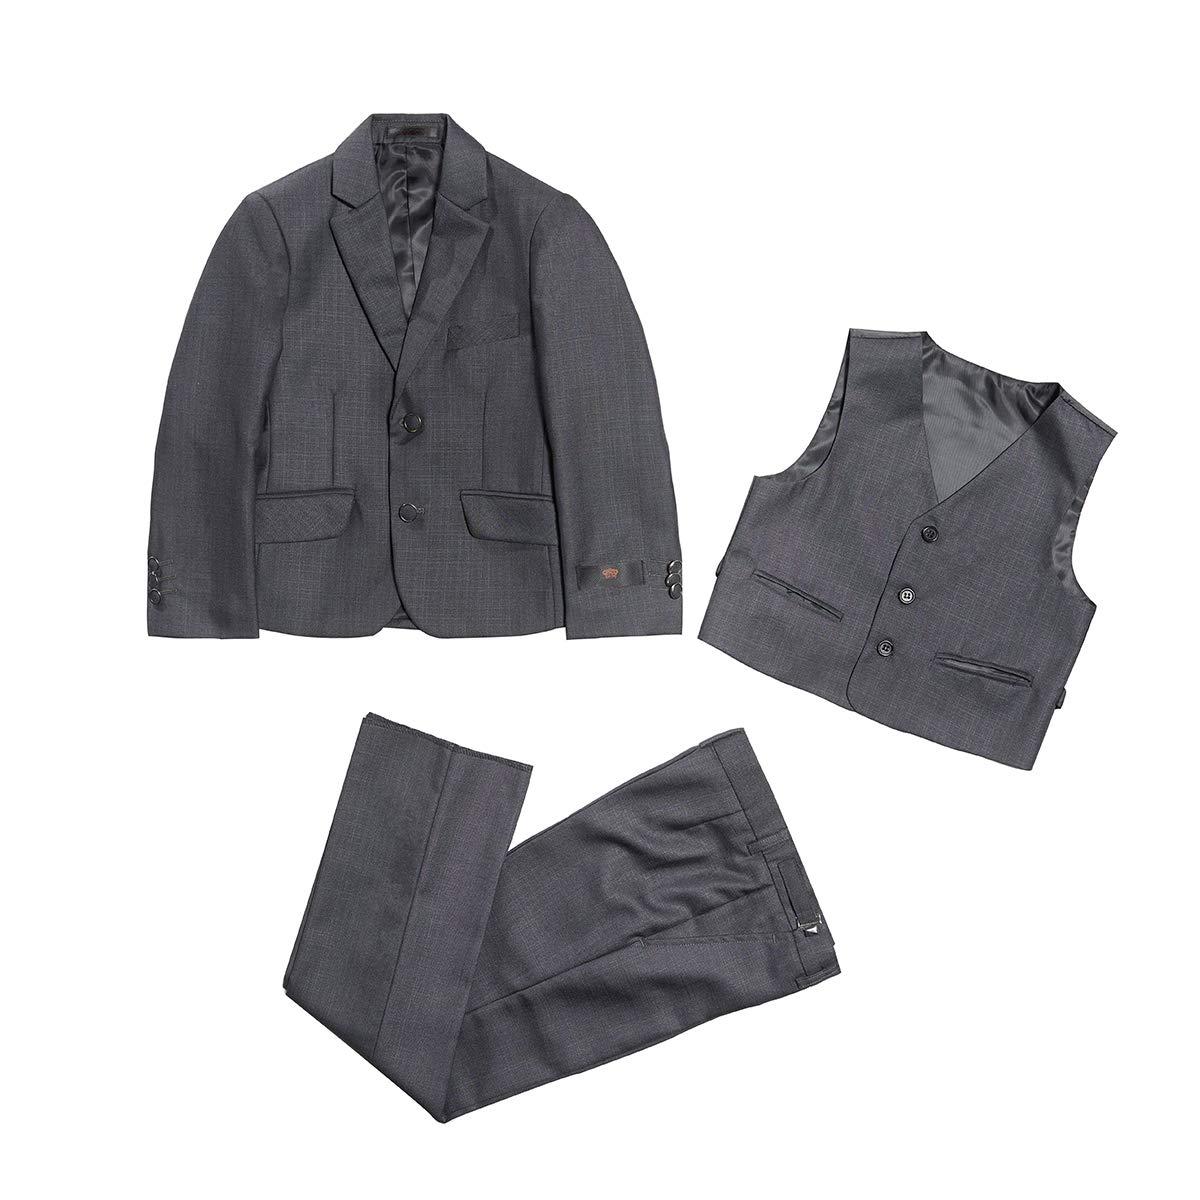 Boys 3 Piece Gray Wedding Formal Suit Jacket Blazer Pants